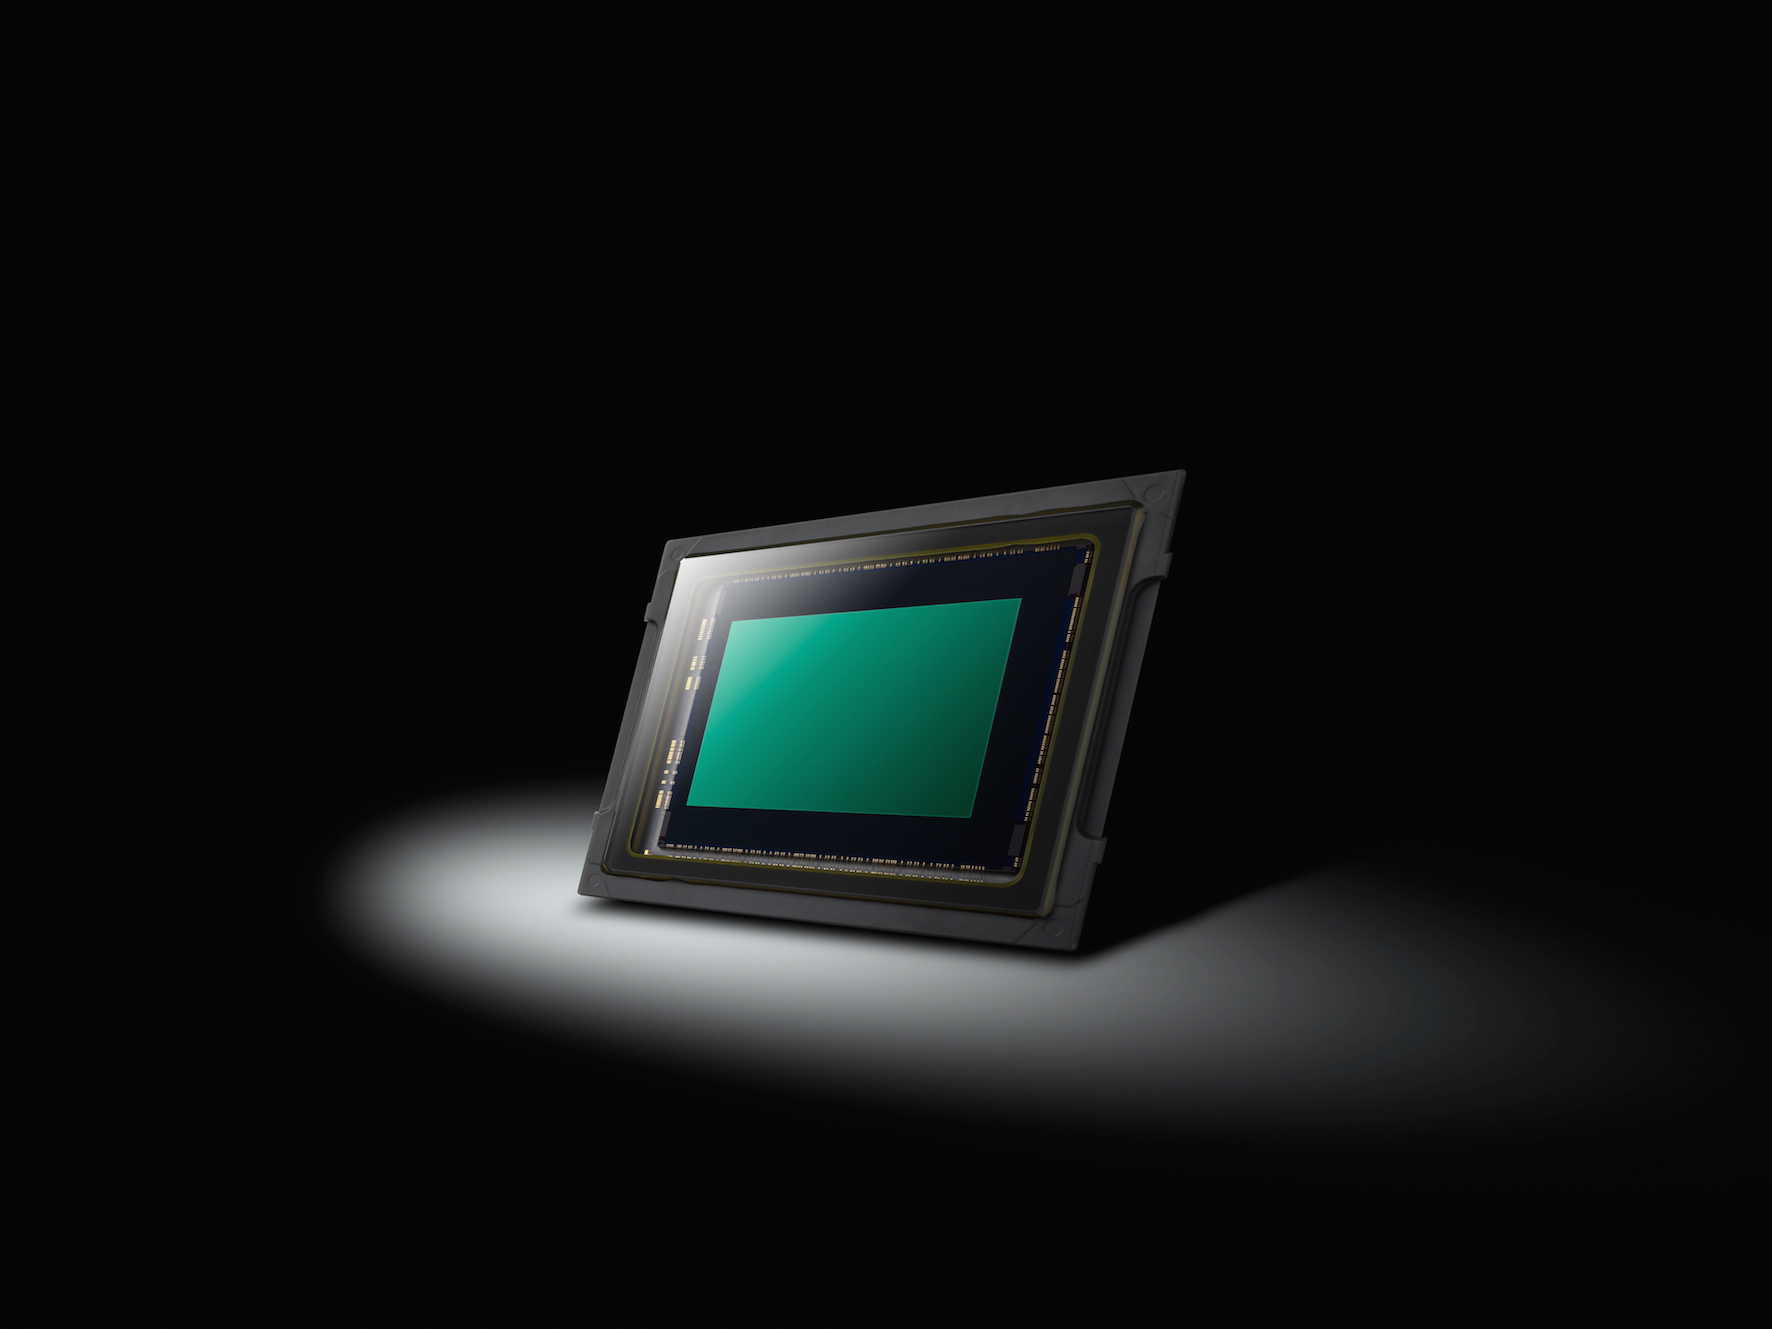 069_FY2017_Panasonic_LUMIX_GH5S_sensor.jpg